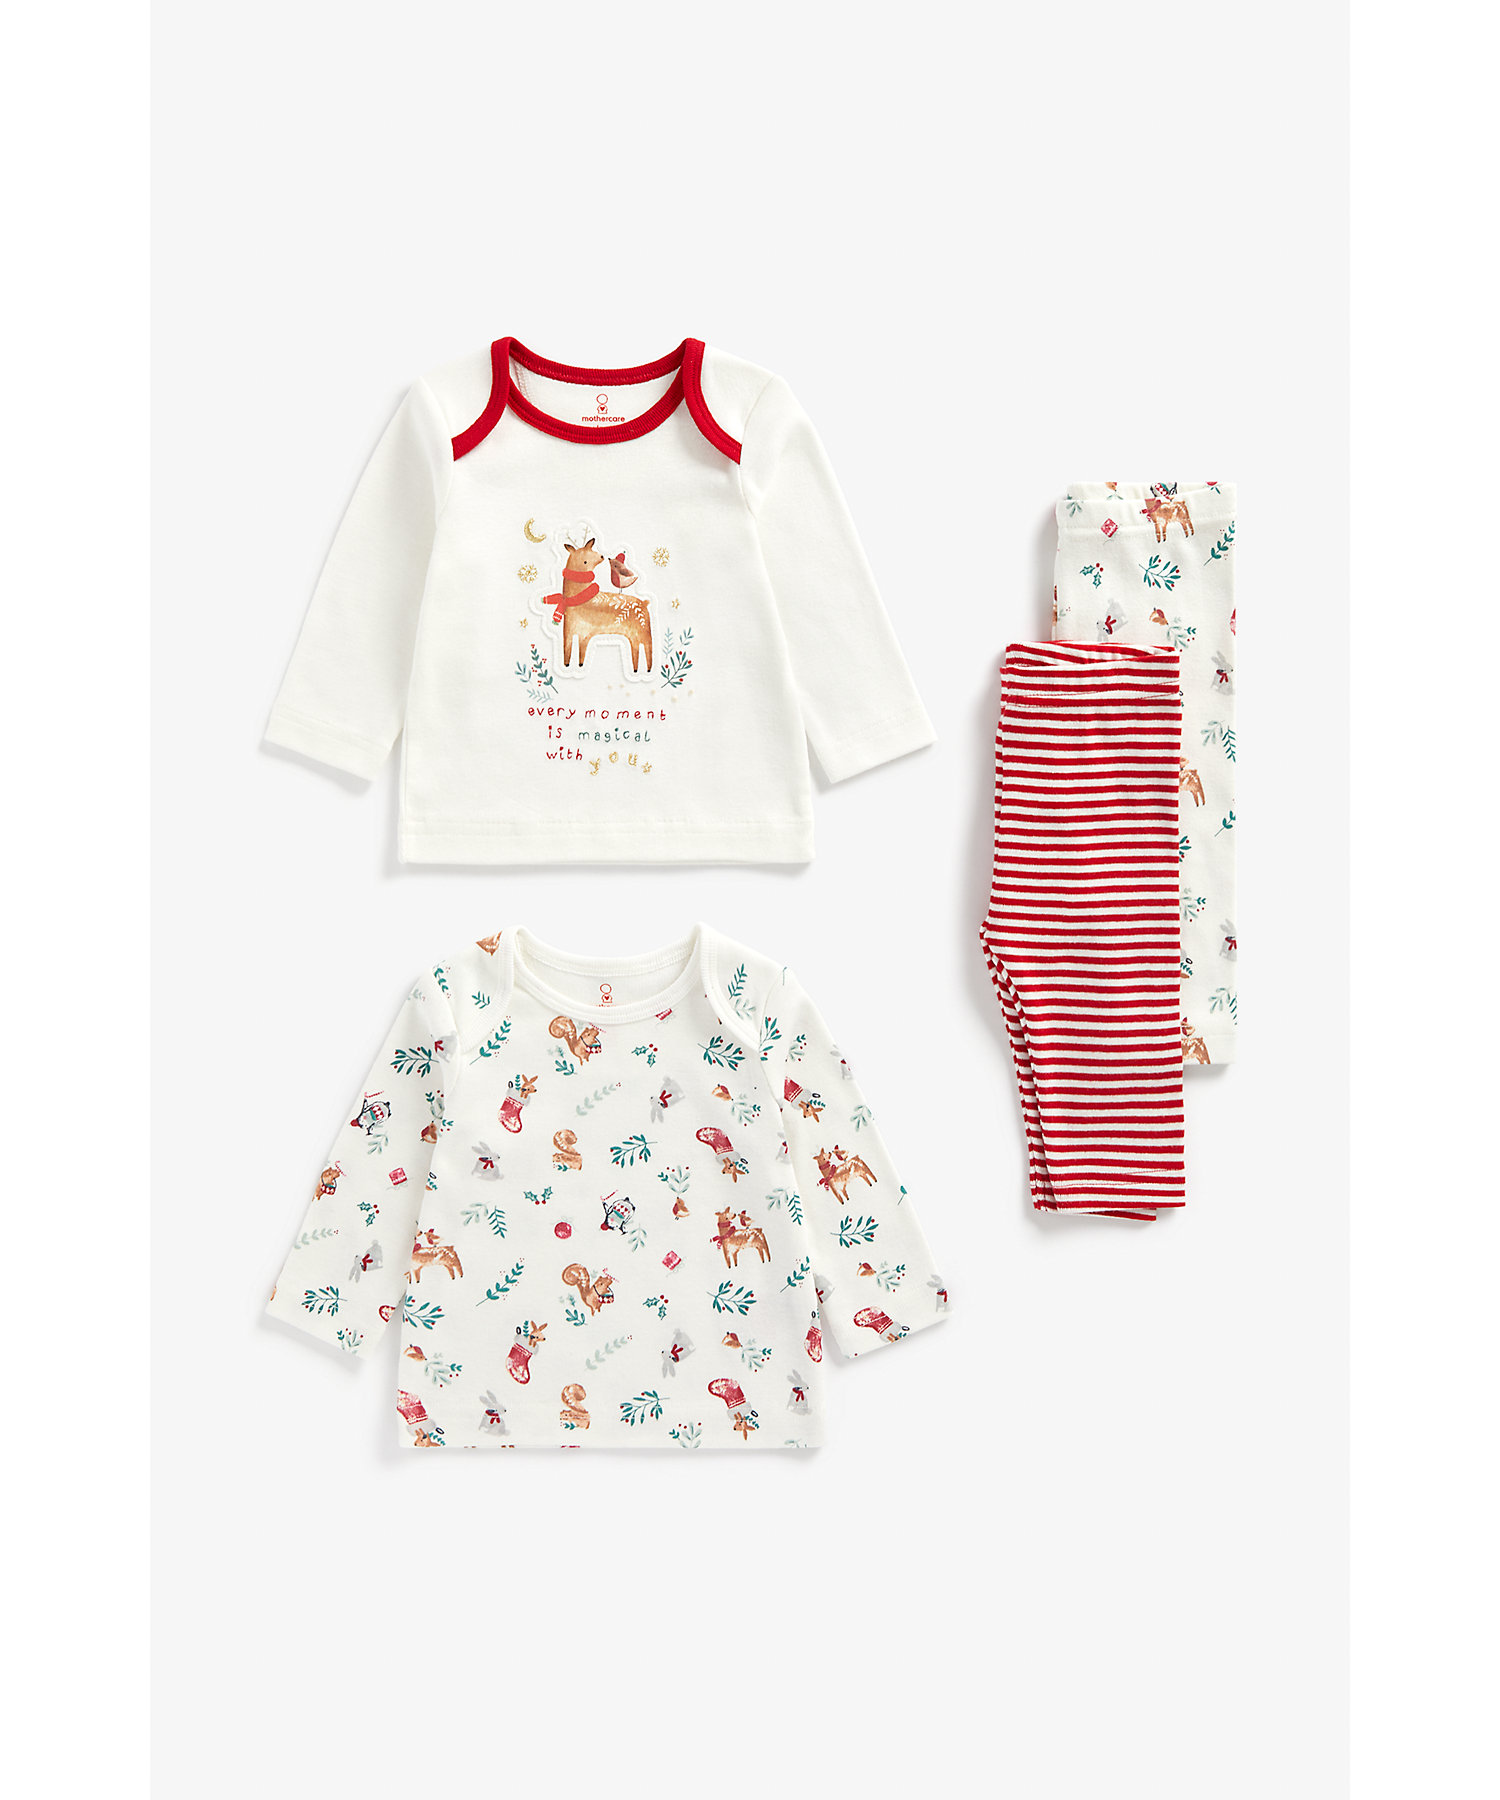 Mothercare | Unisex Full Sleeves Pyjama Set -Pack of 2-Multicolor